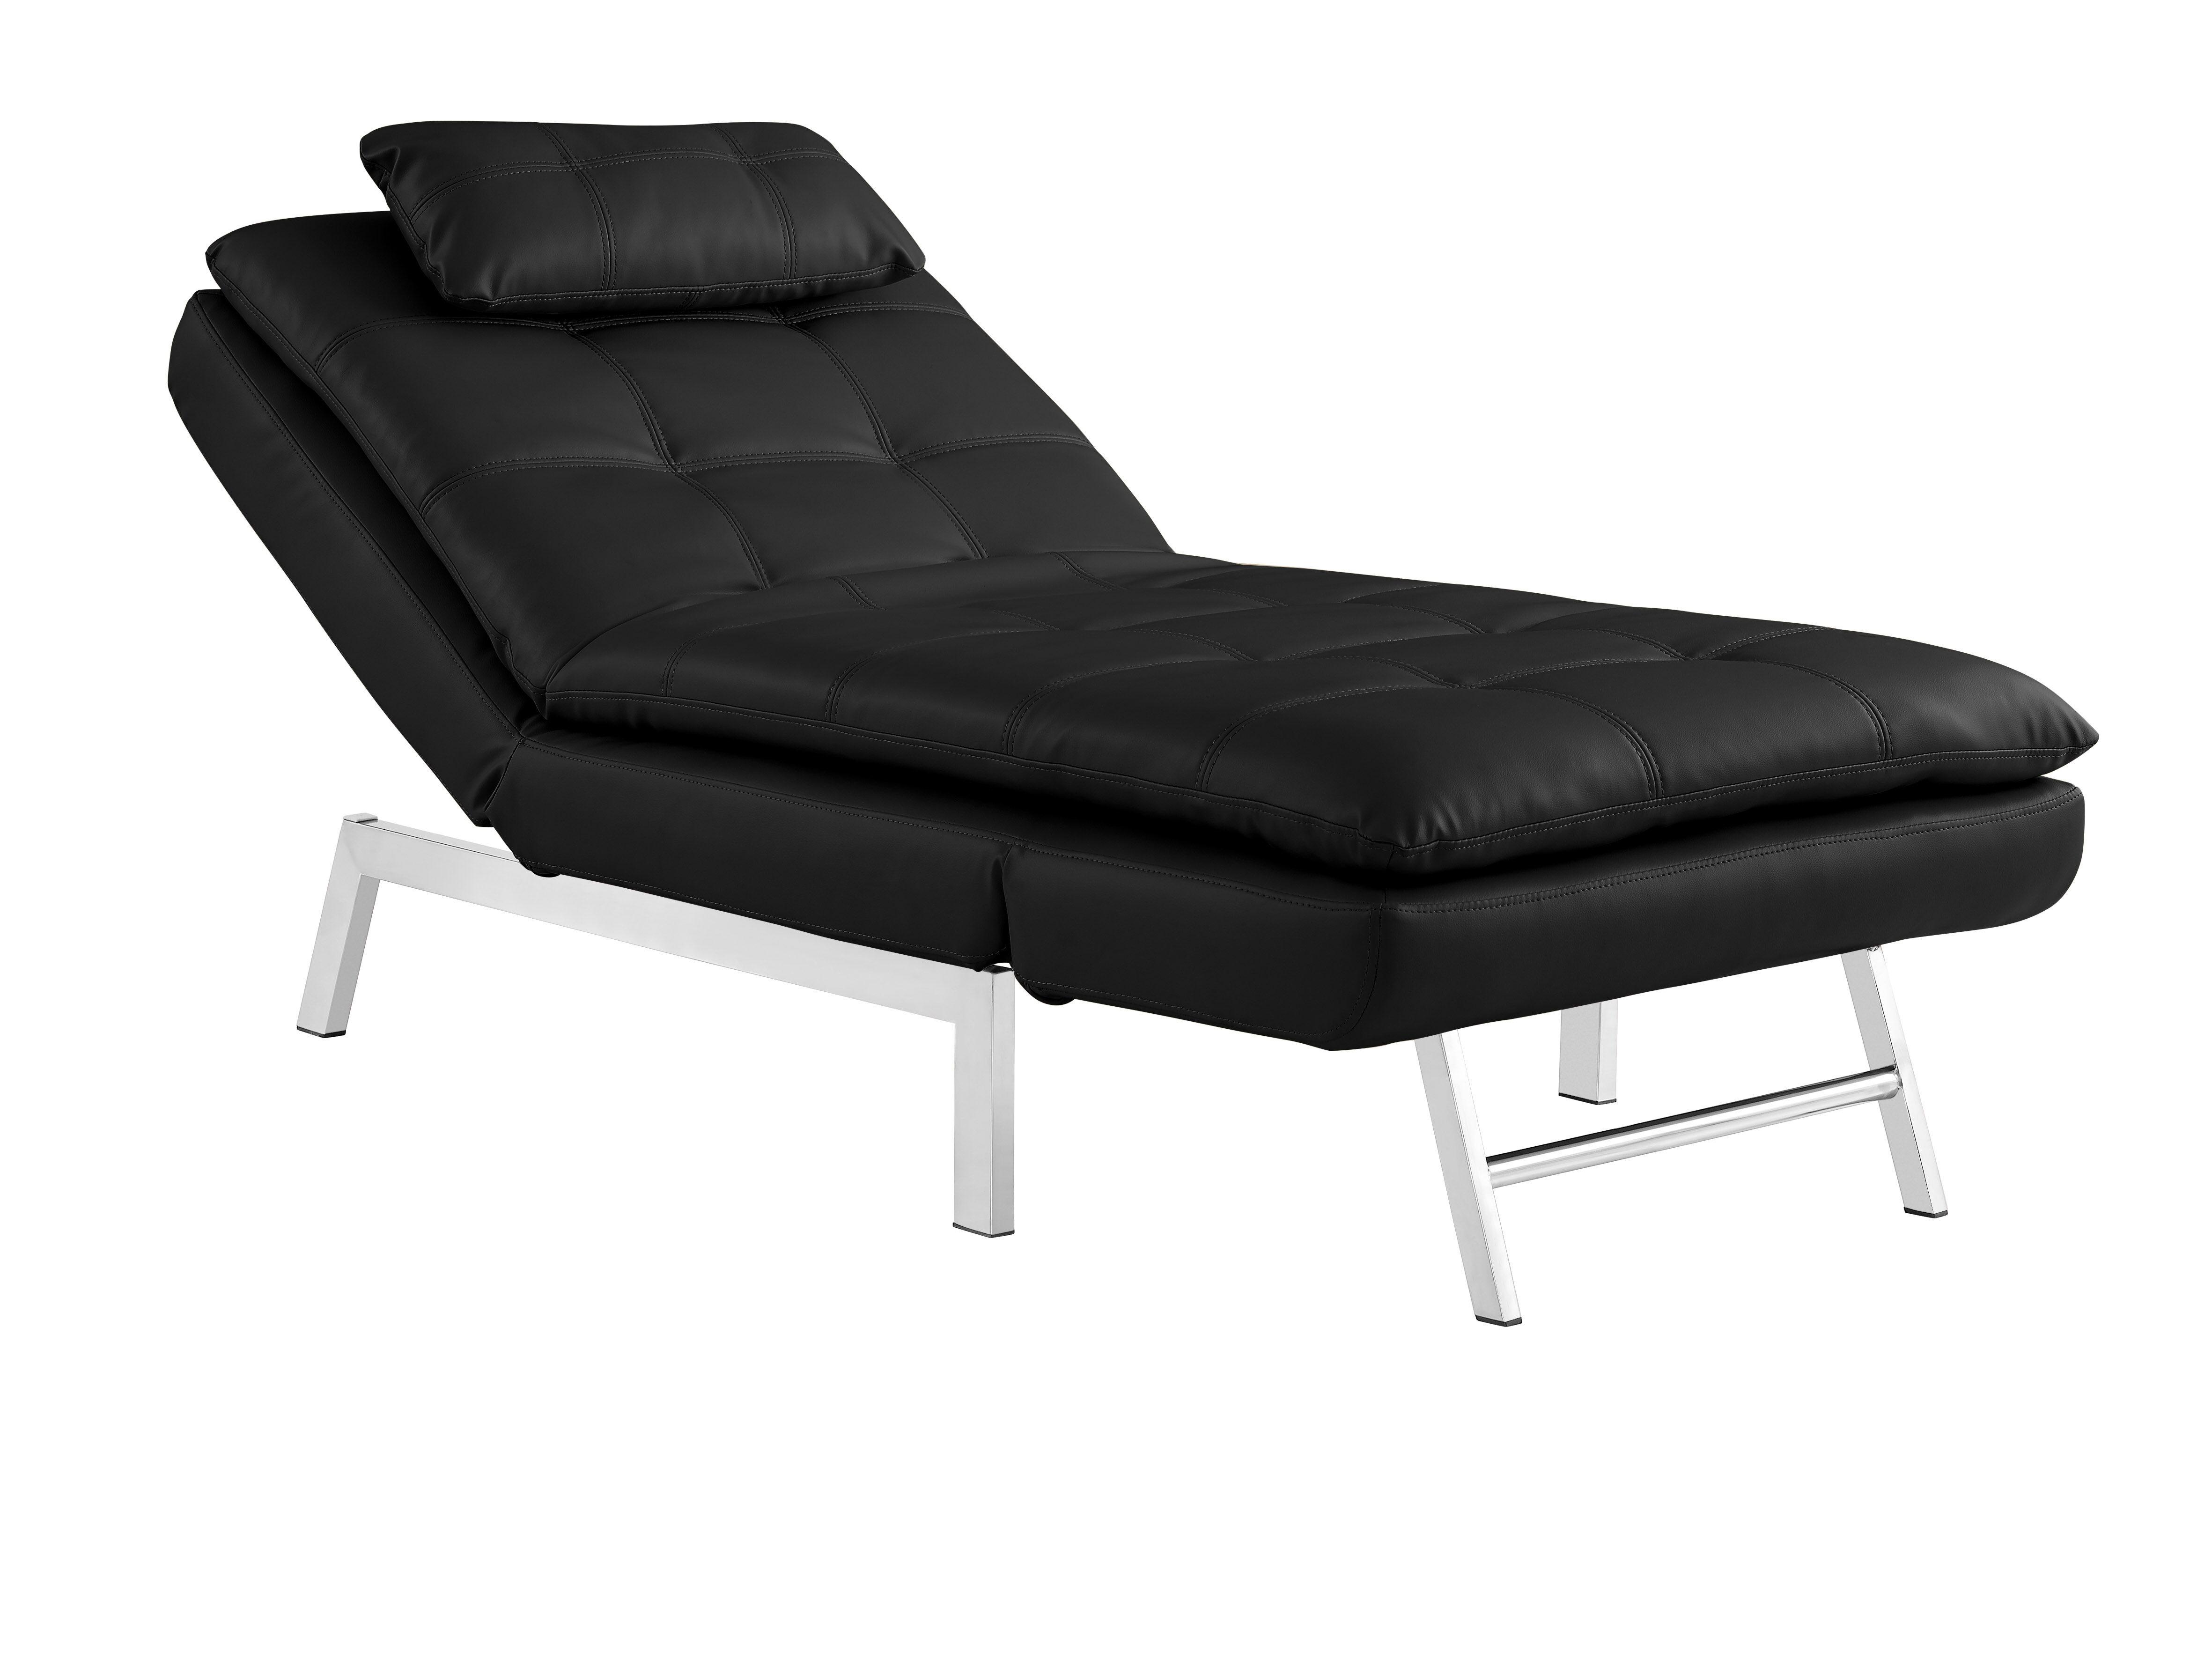 Vienna Chaise Black By Serta Lifestyle